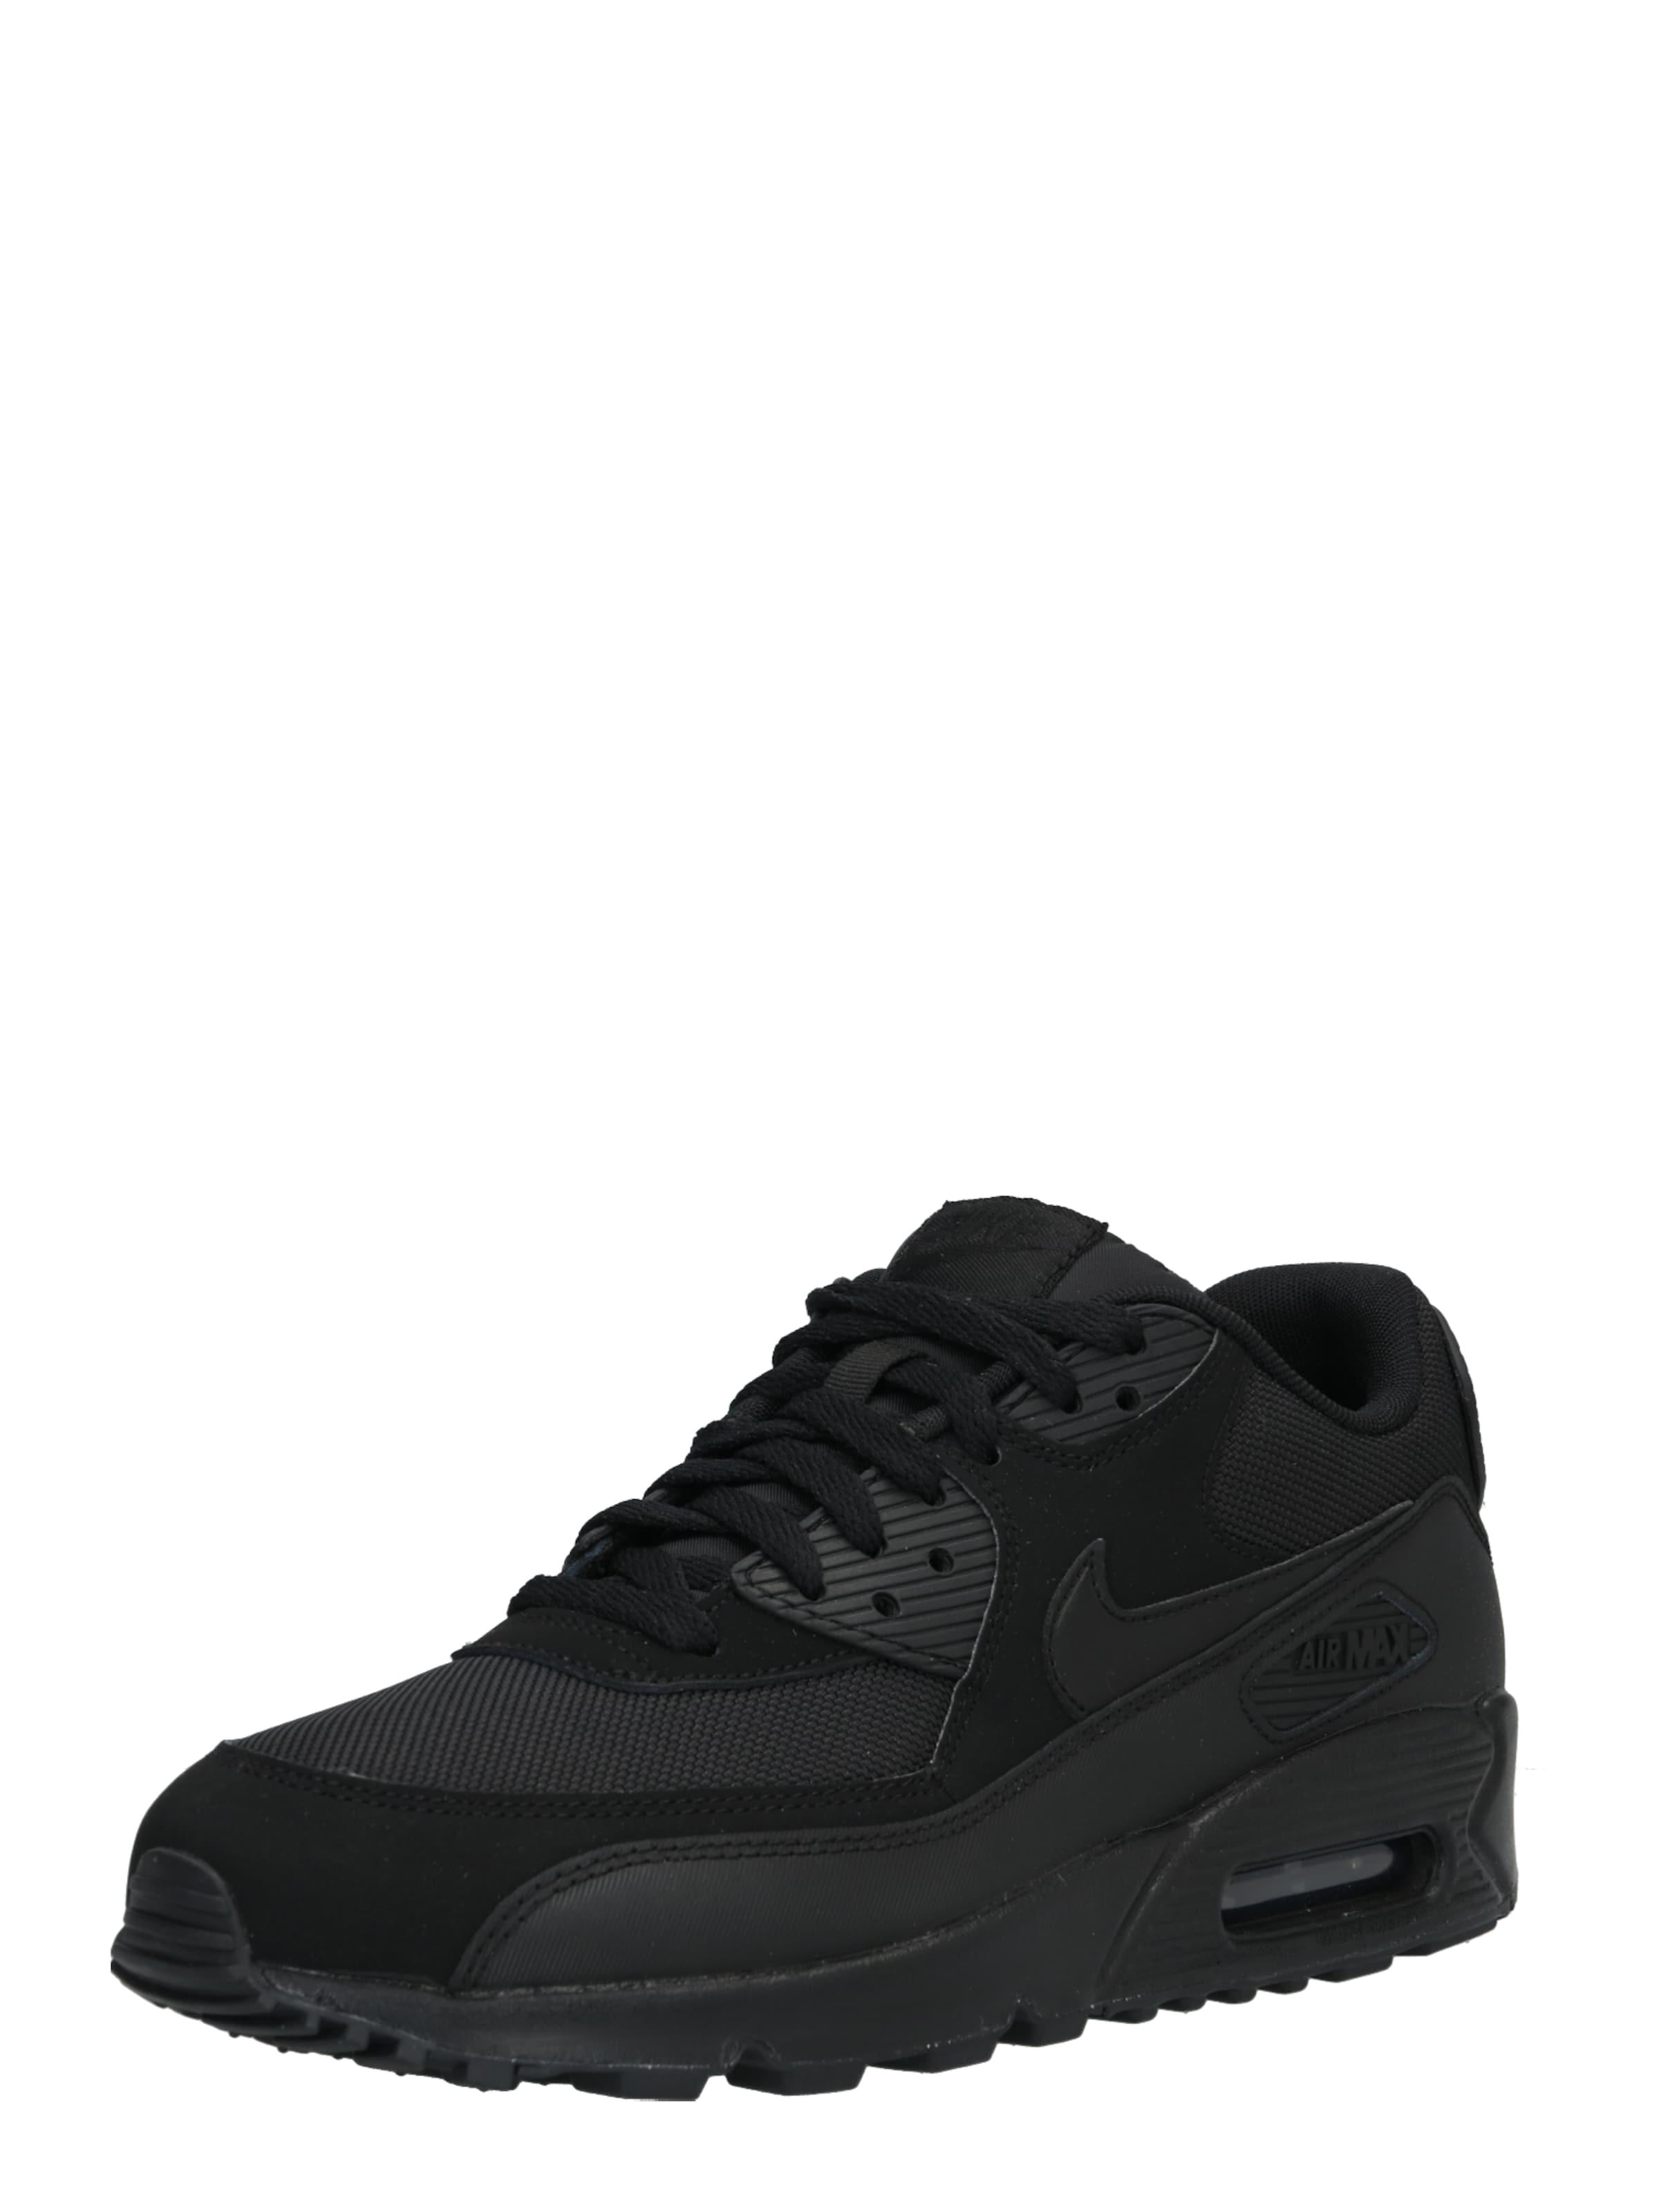 Sportswear 'air In Max 90' Schwarz Nike Sneaker jARL354